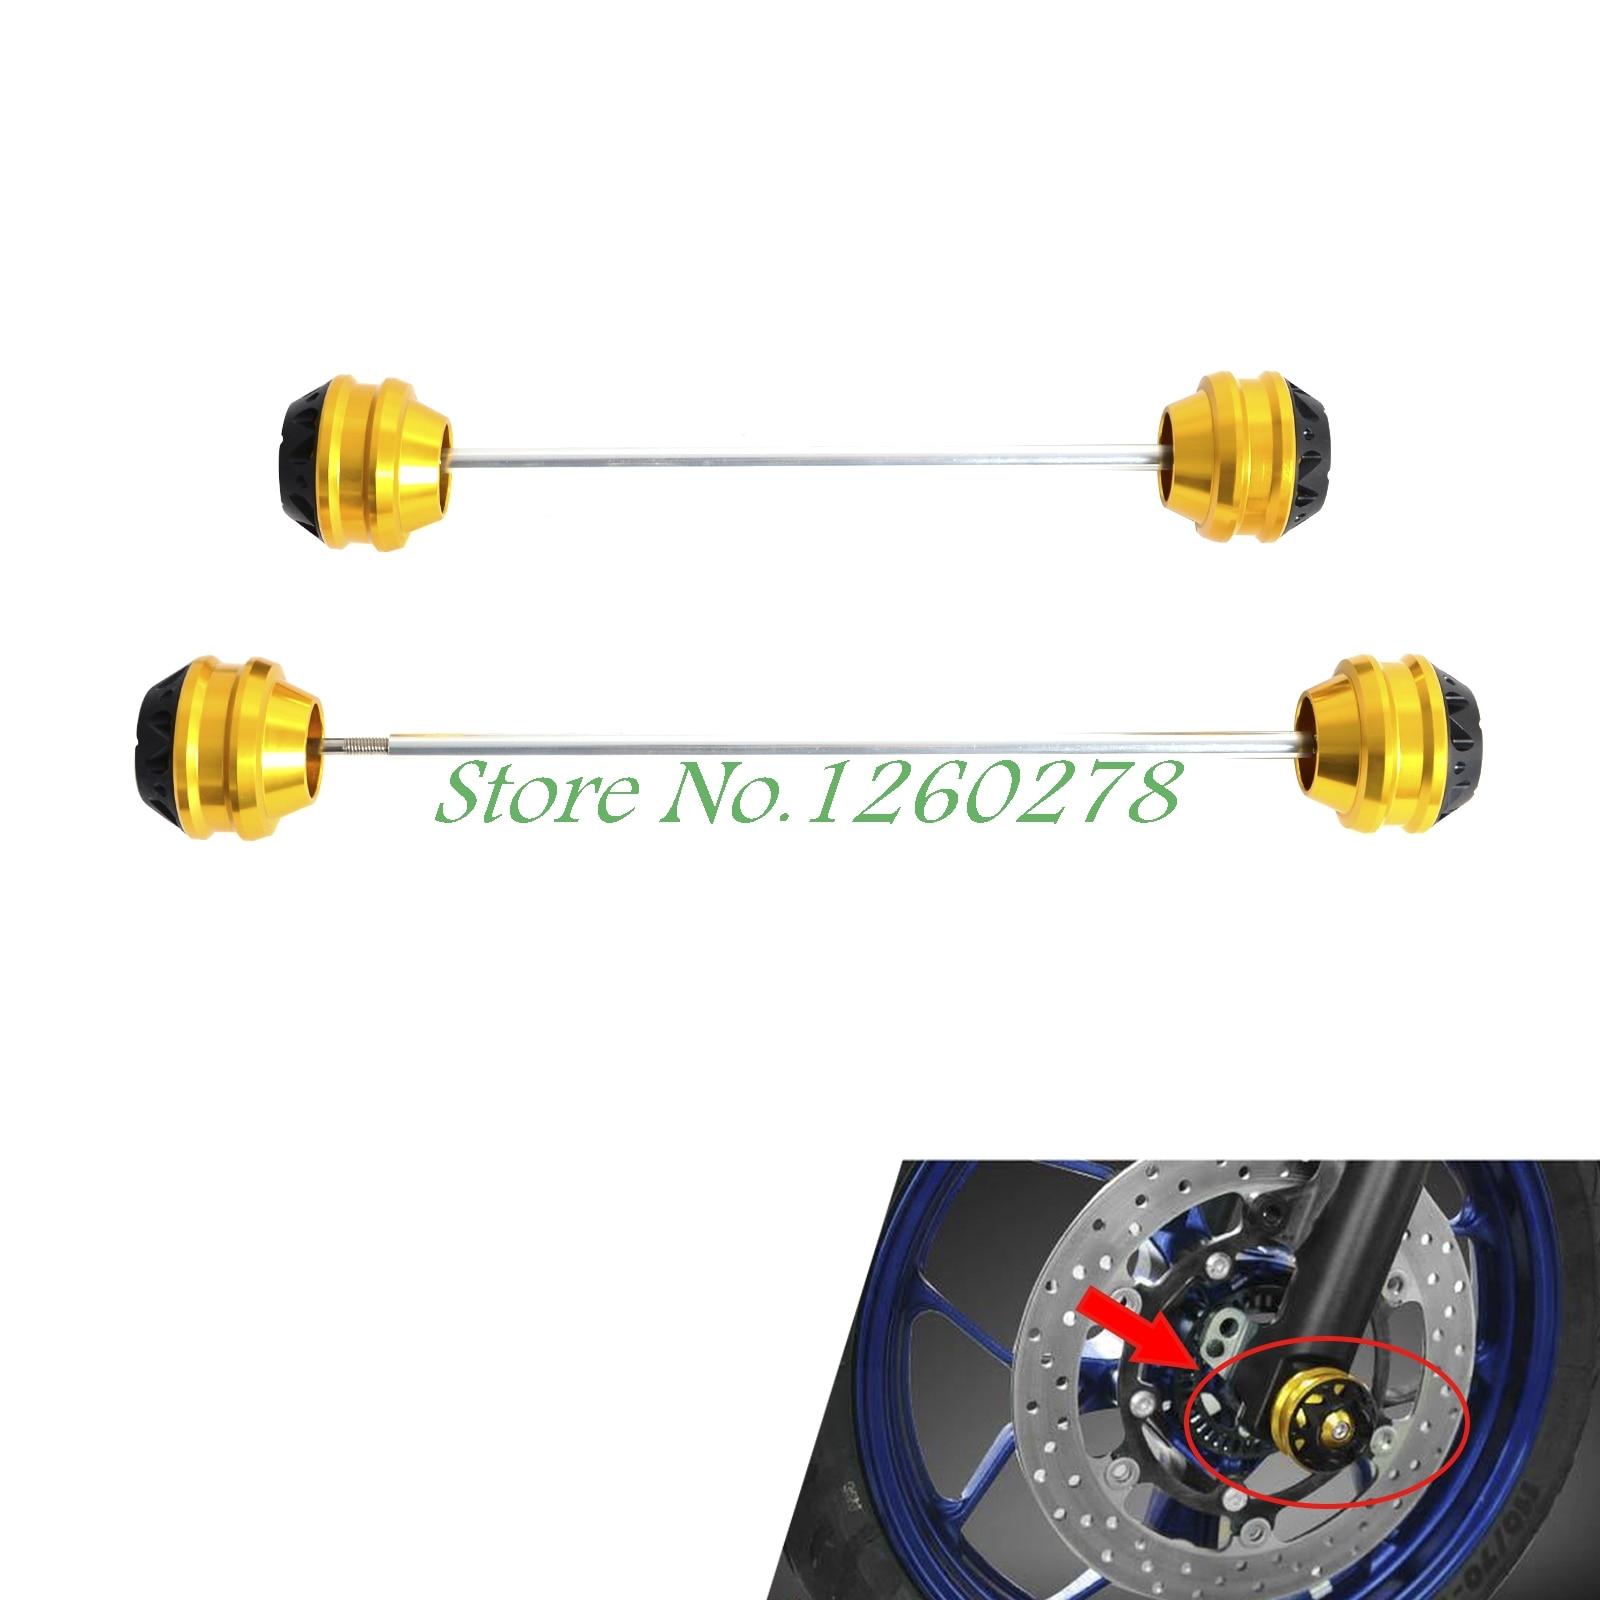 Front &amp; Rear CNC Wheel Axle Fork Crash Protector Slider For Yamaha  MT07 FZ07 2014 2015 2016 MT FZ 07<br>